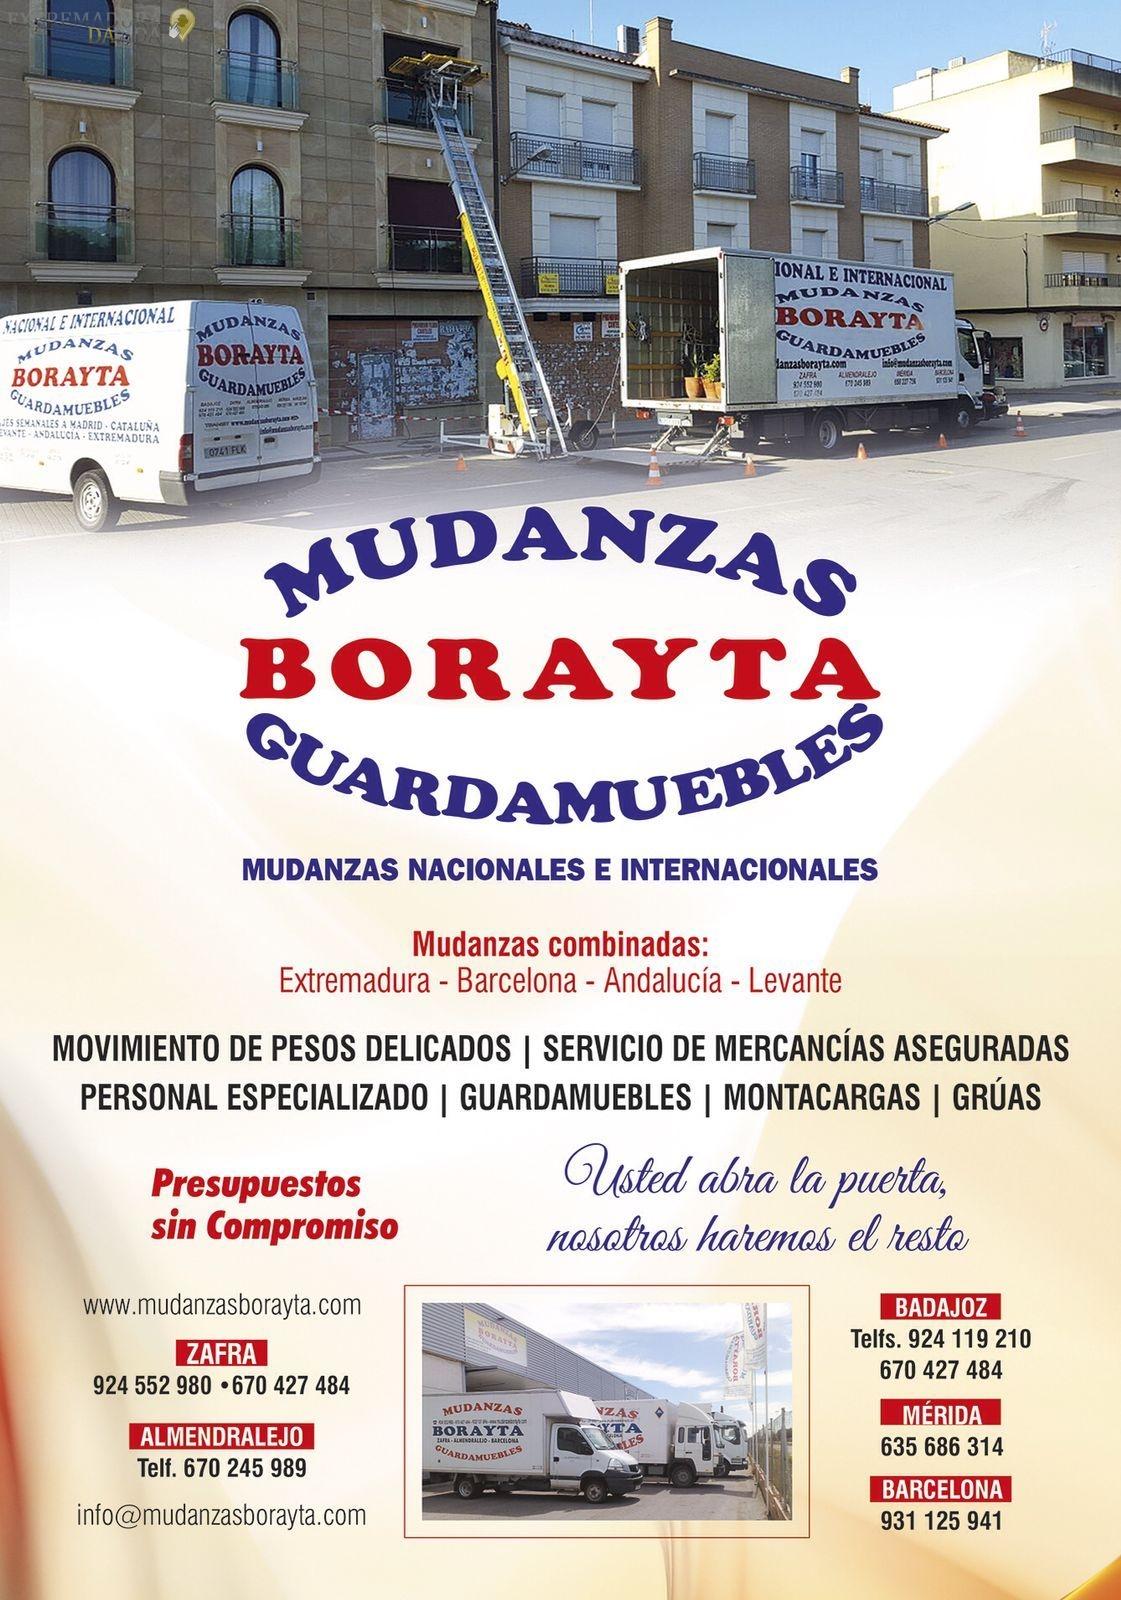 MUDANZAS BORAYTA GUARDAMUEBLES BADAJOZ